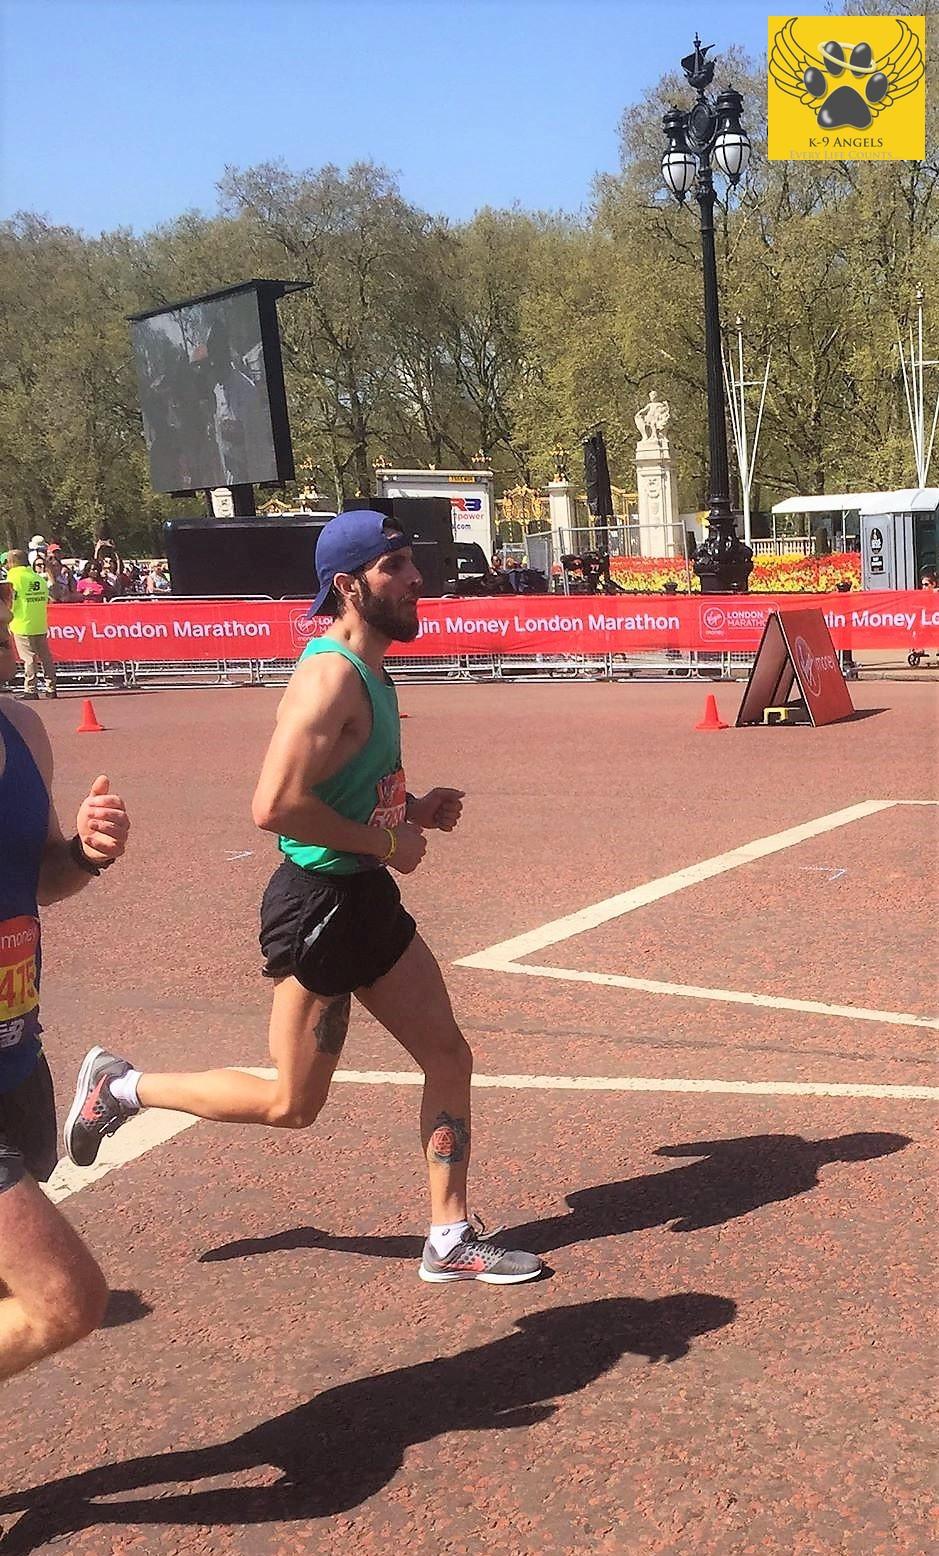 Adrian nearing the finish line!